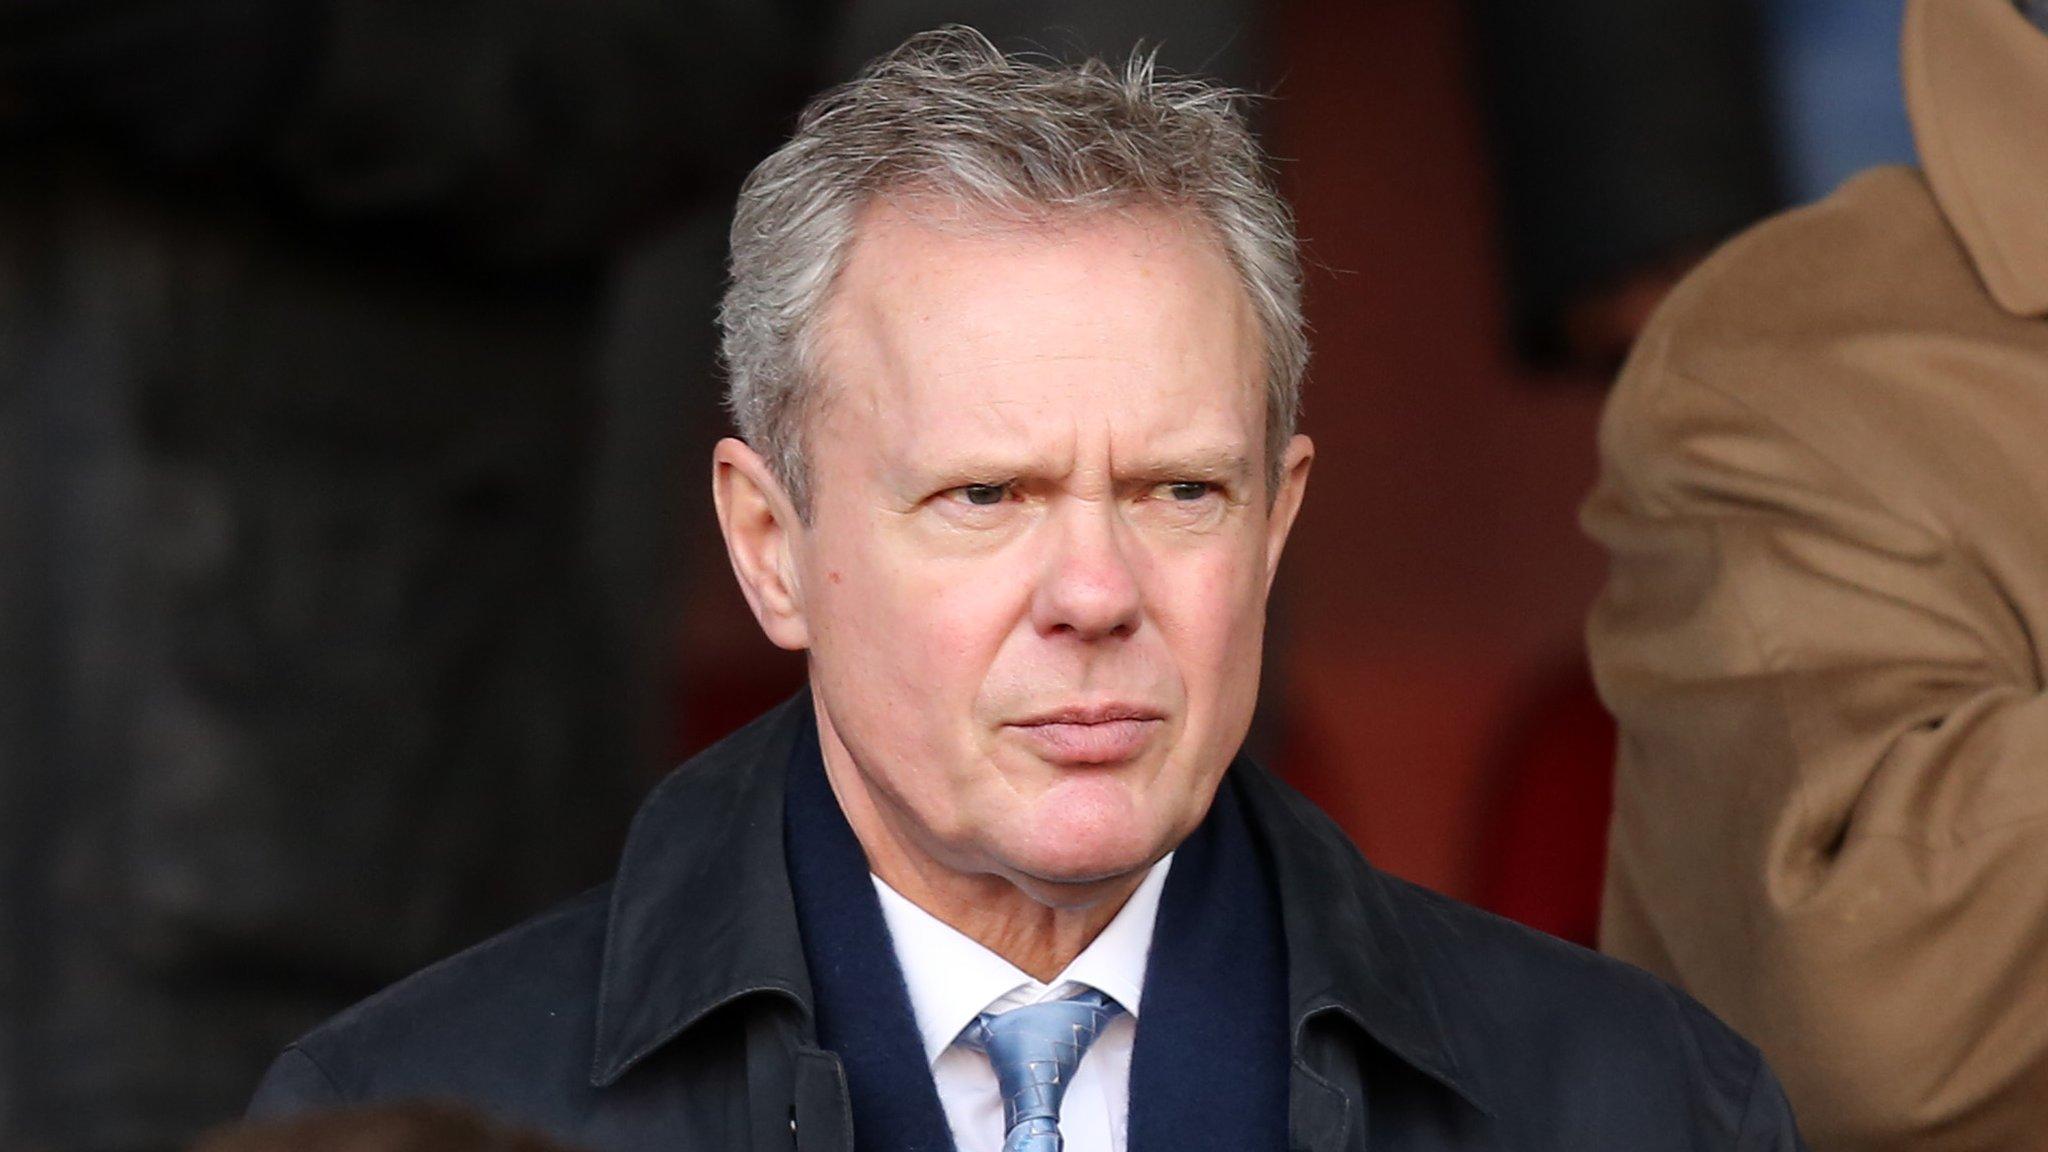 Swansea City: Trevor Birch appointed chairman of Championship club